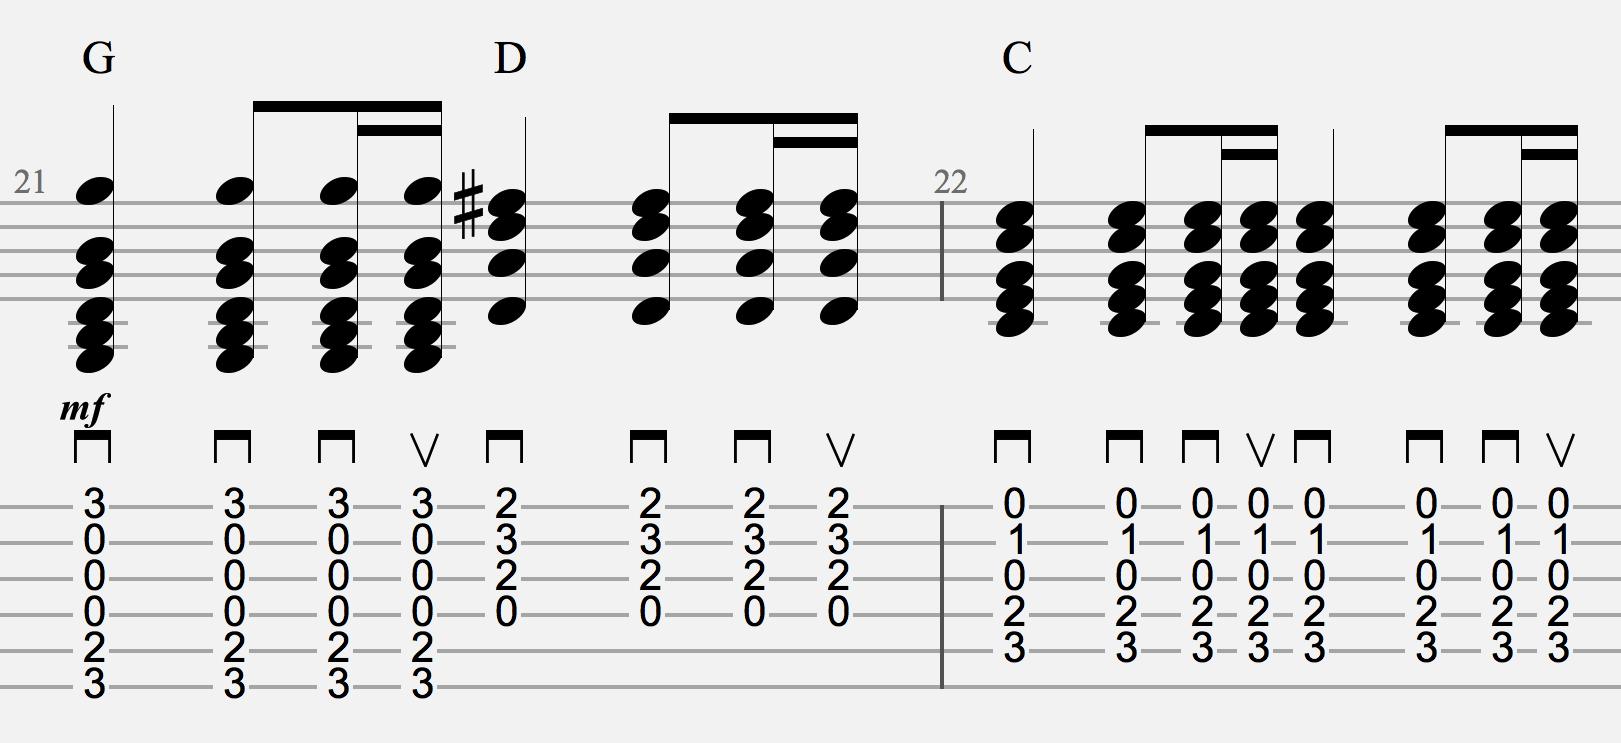 Semi-quaver strumming patterns and knocking on heavens door u2013 Bob Dylan : JS MUSIC SCHOOL